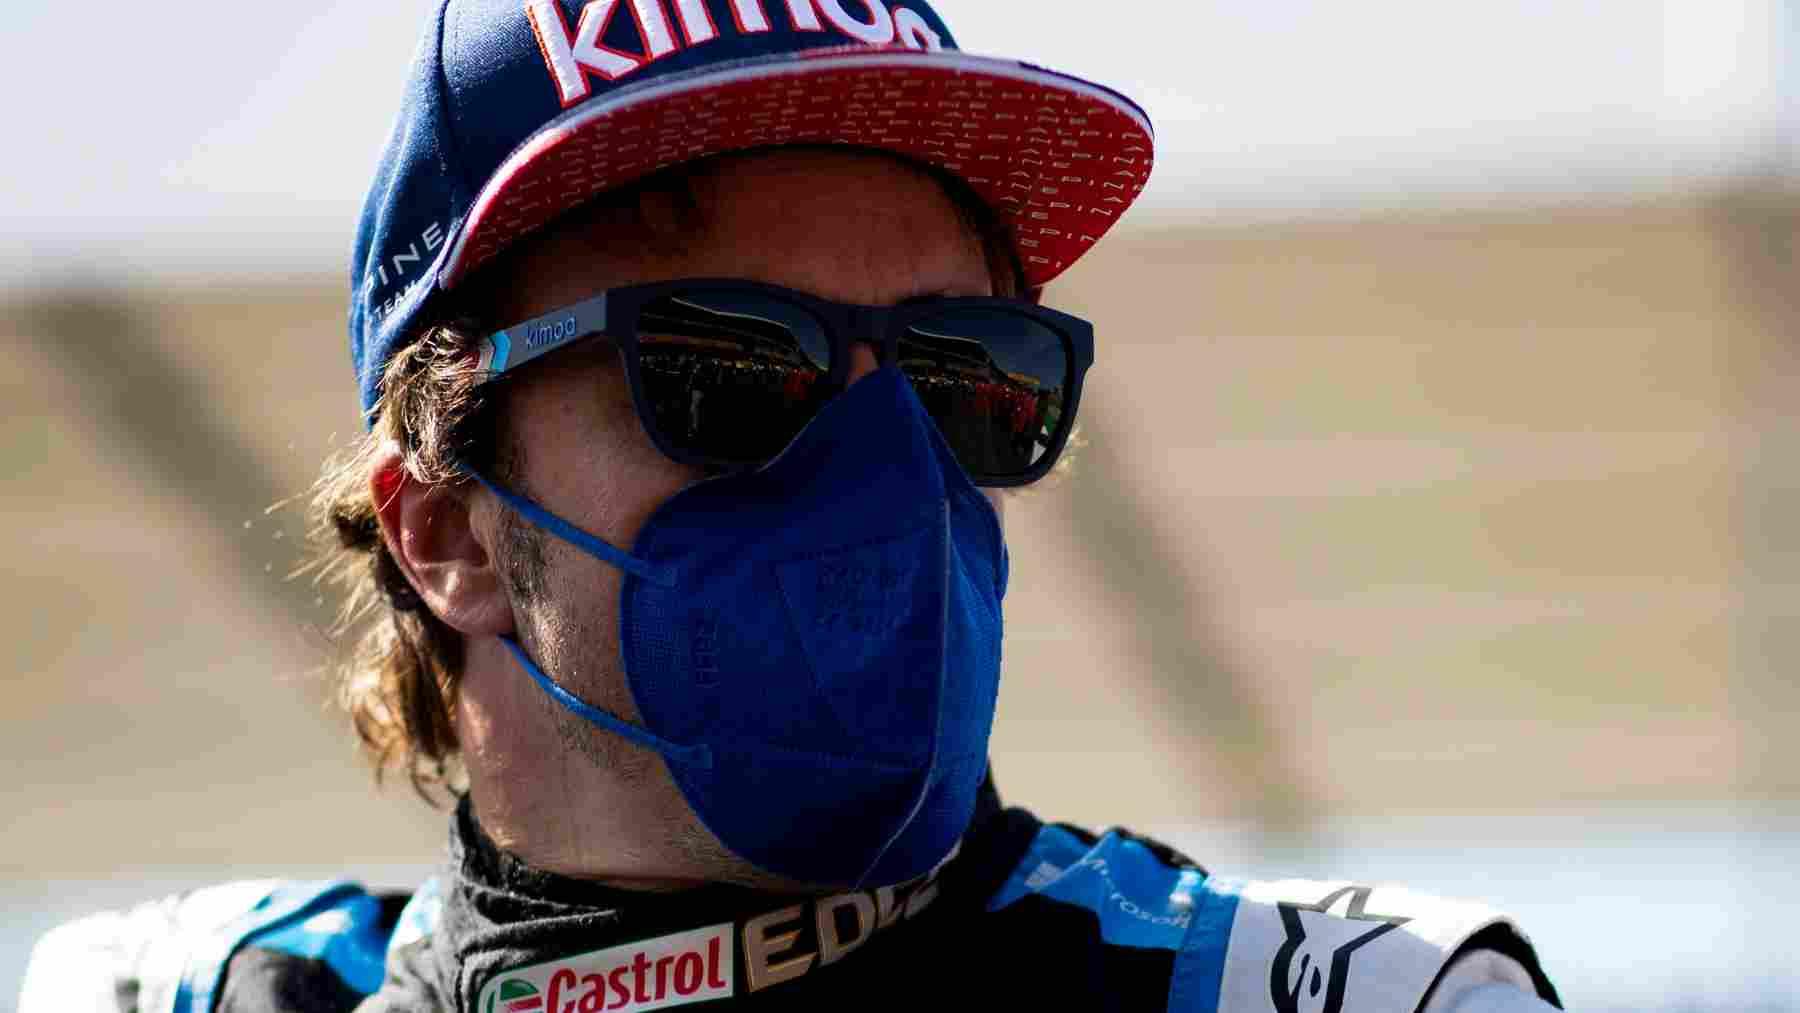 Fernando Alonso, piloto de Alpine. (@AlpineF1Team)